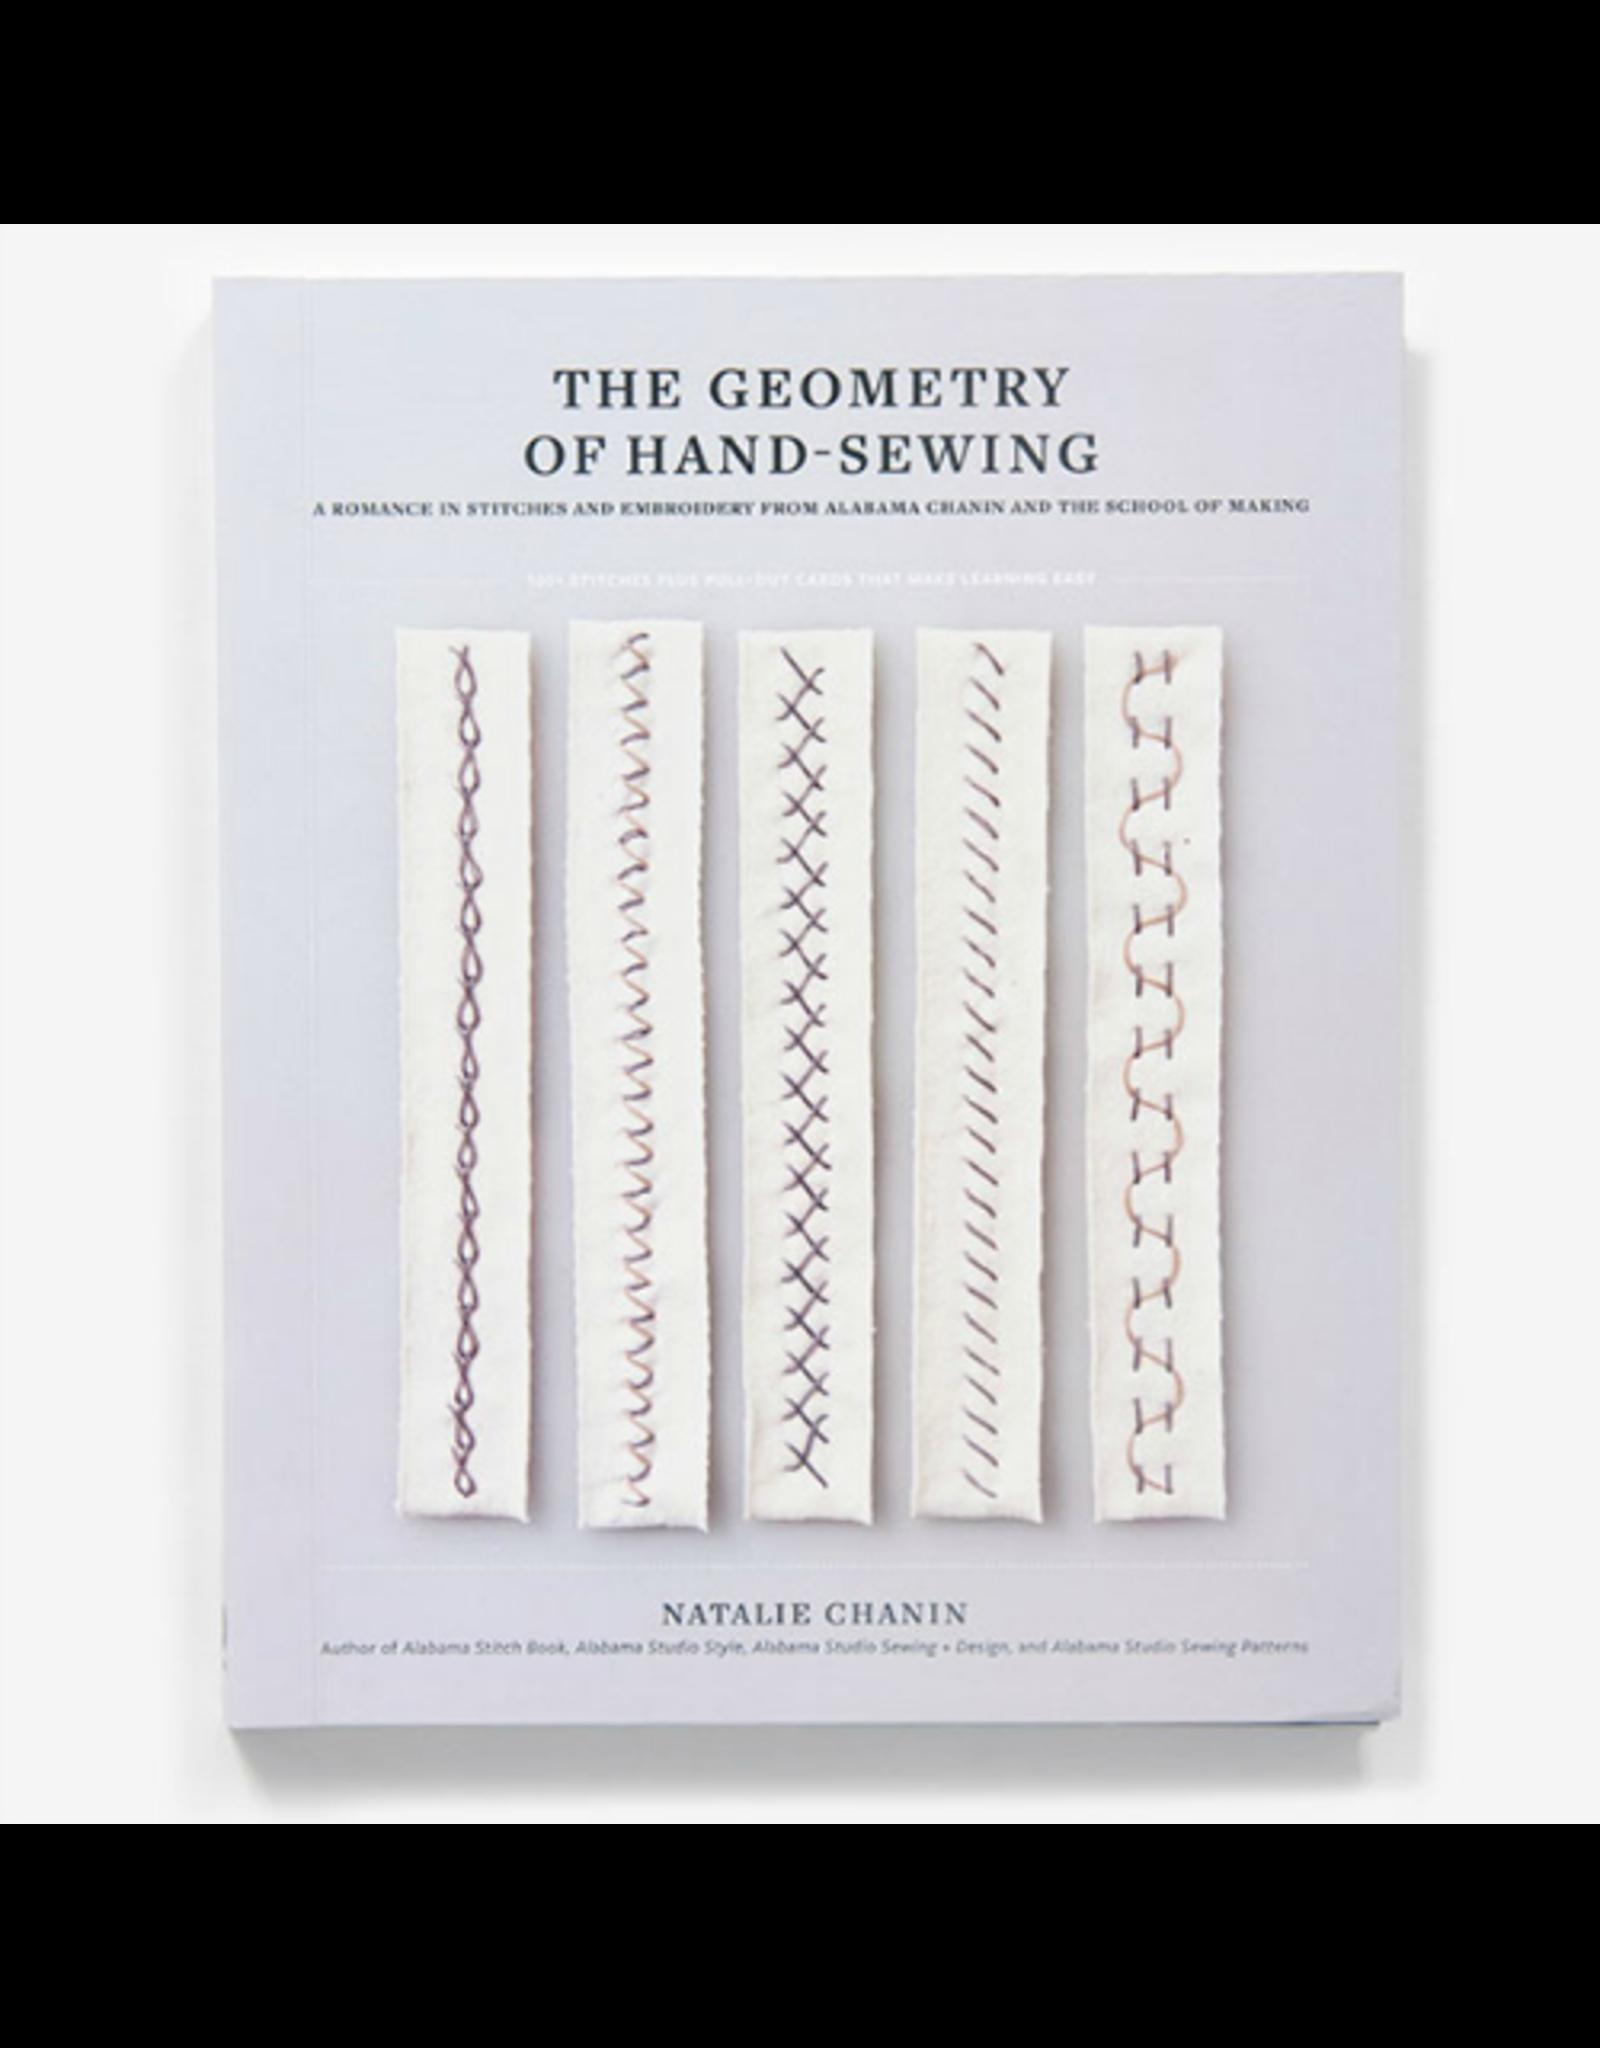 Natalie Chanin of Alabama Chanin The Geometry of Hand-Sewing